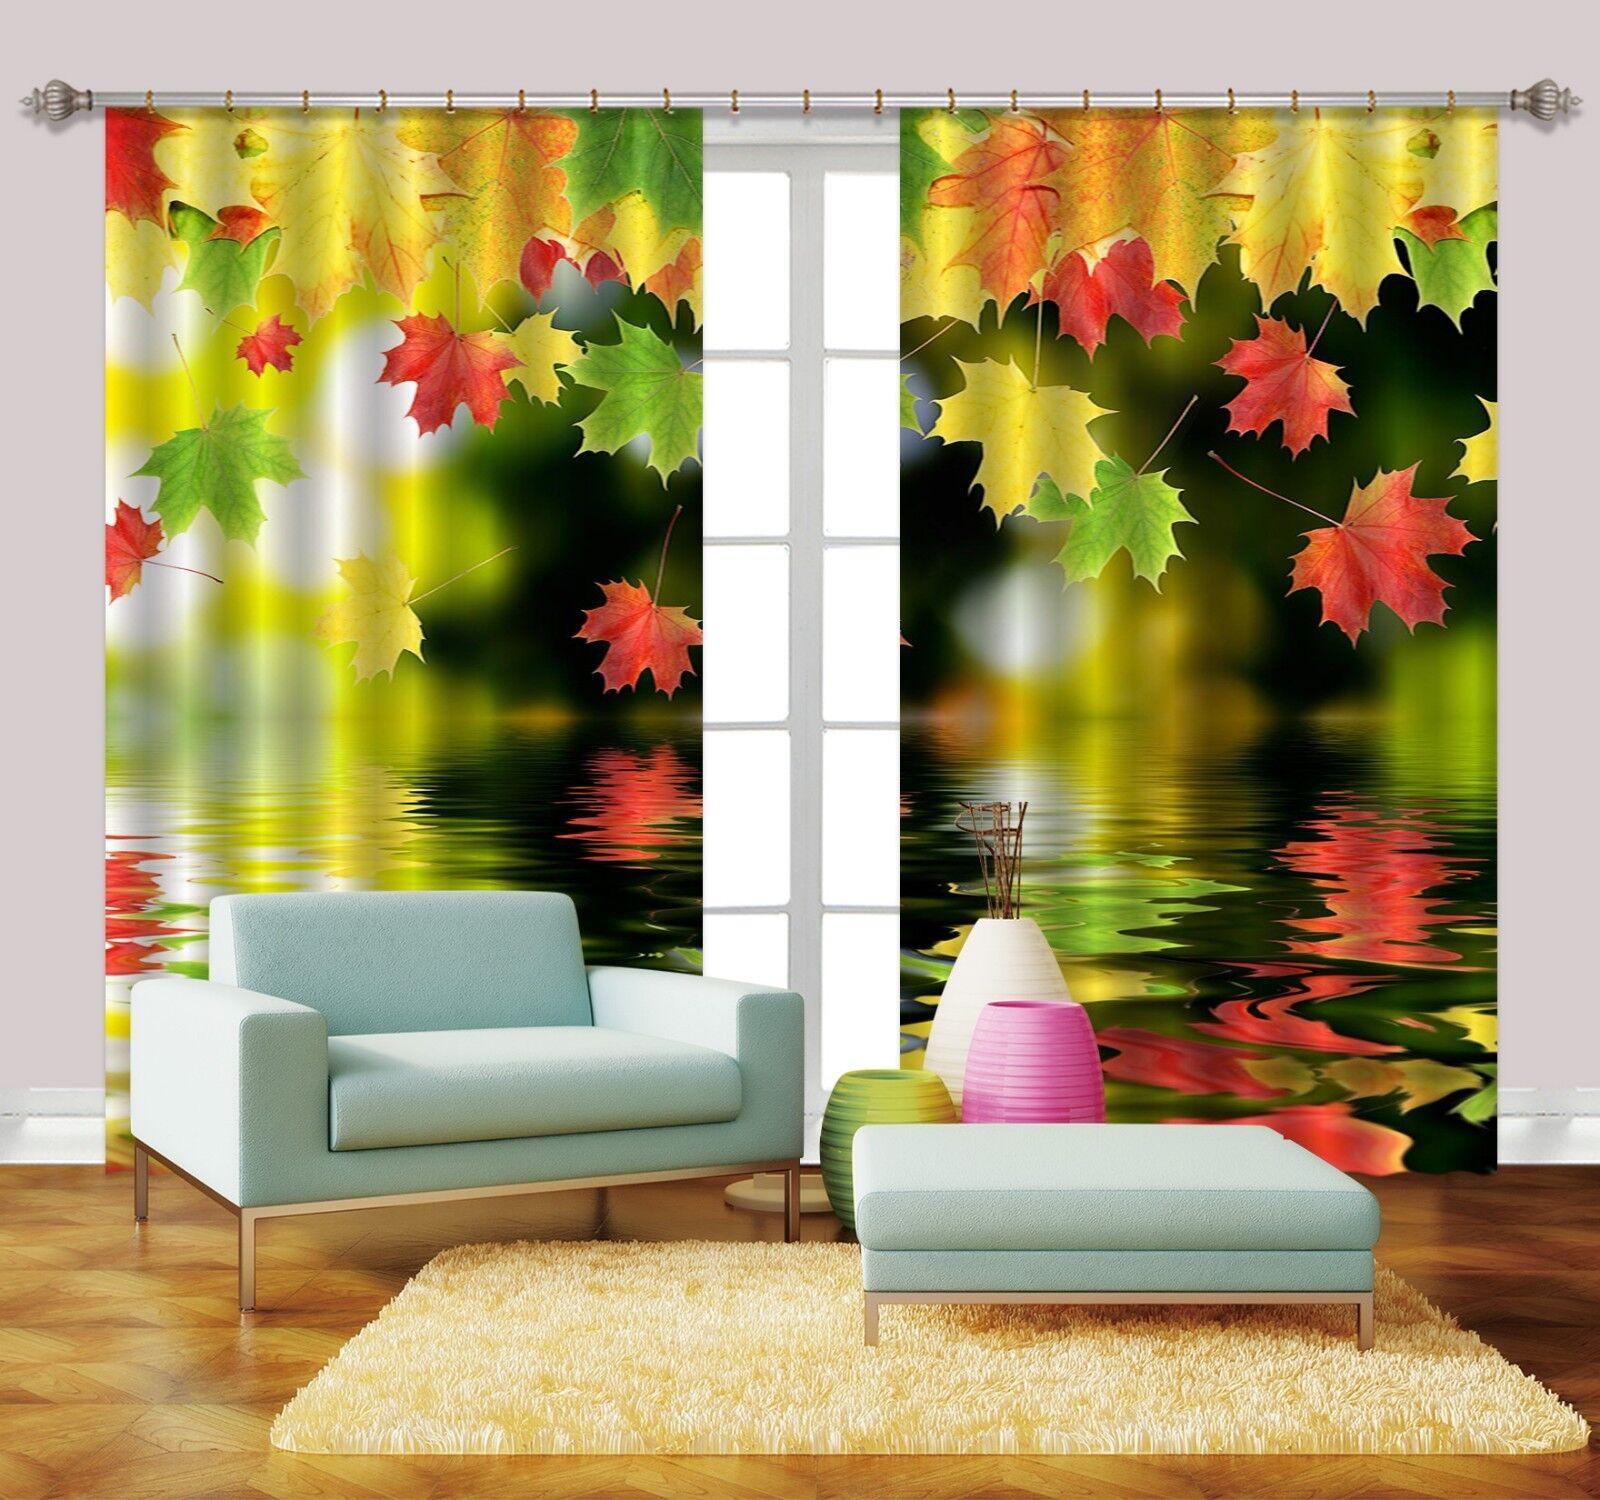 3d rojo hoja de arce bloqueo 6 cortina de fotografía presión cortinas cortina de tela de ventana